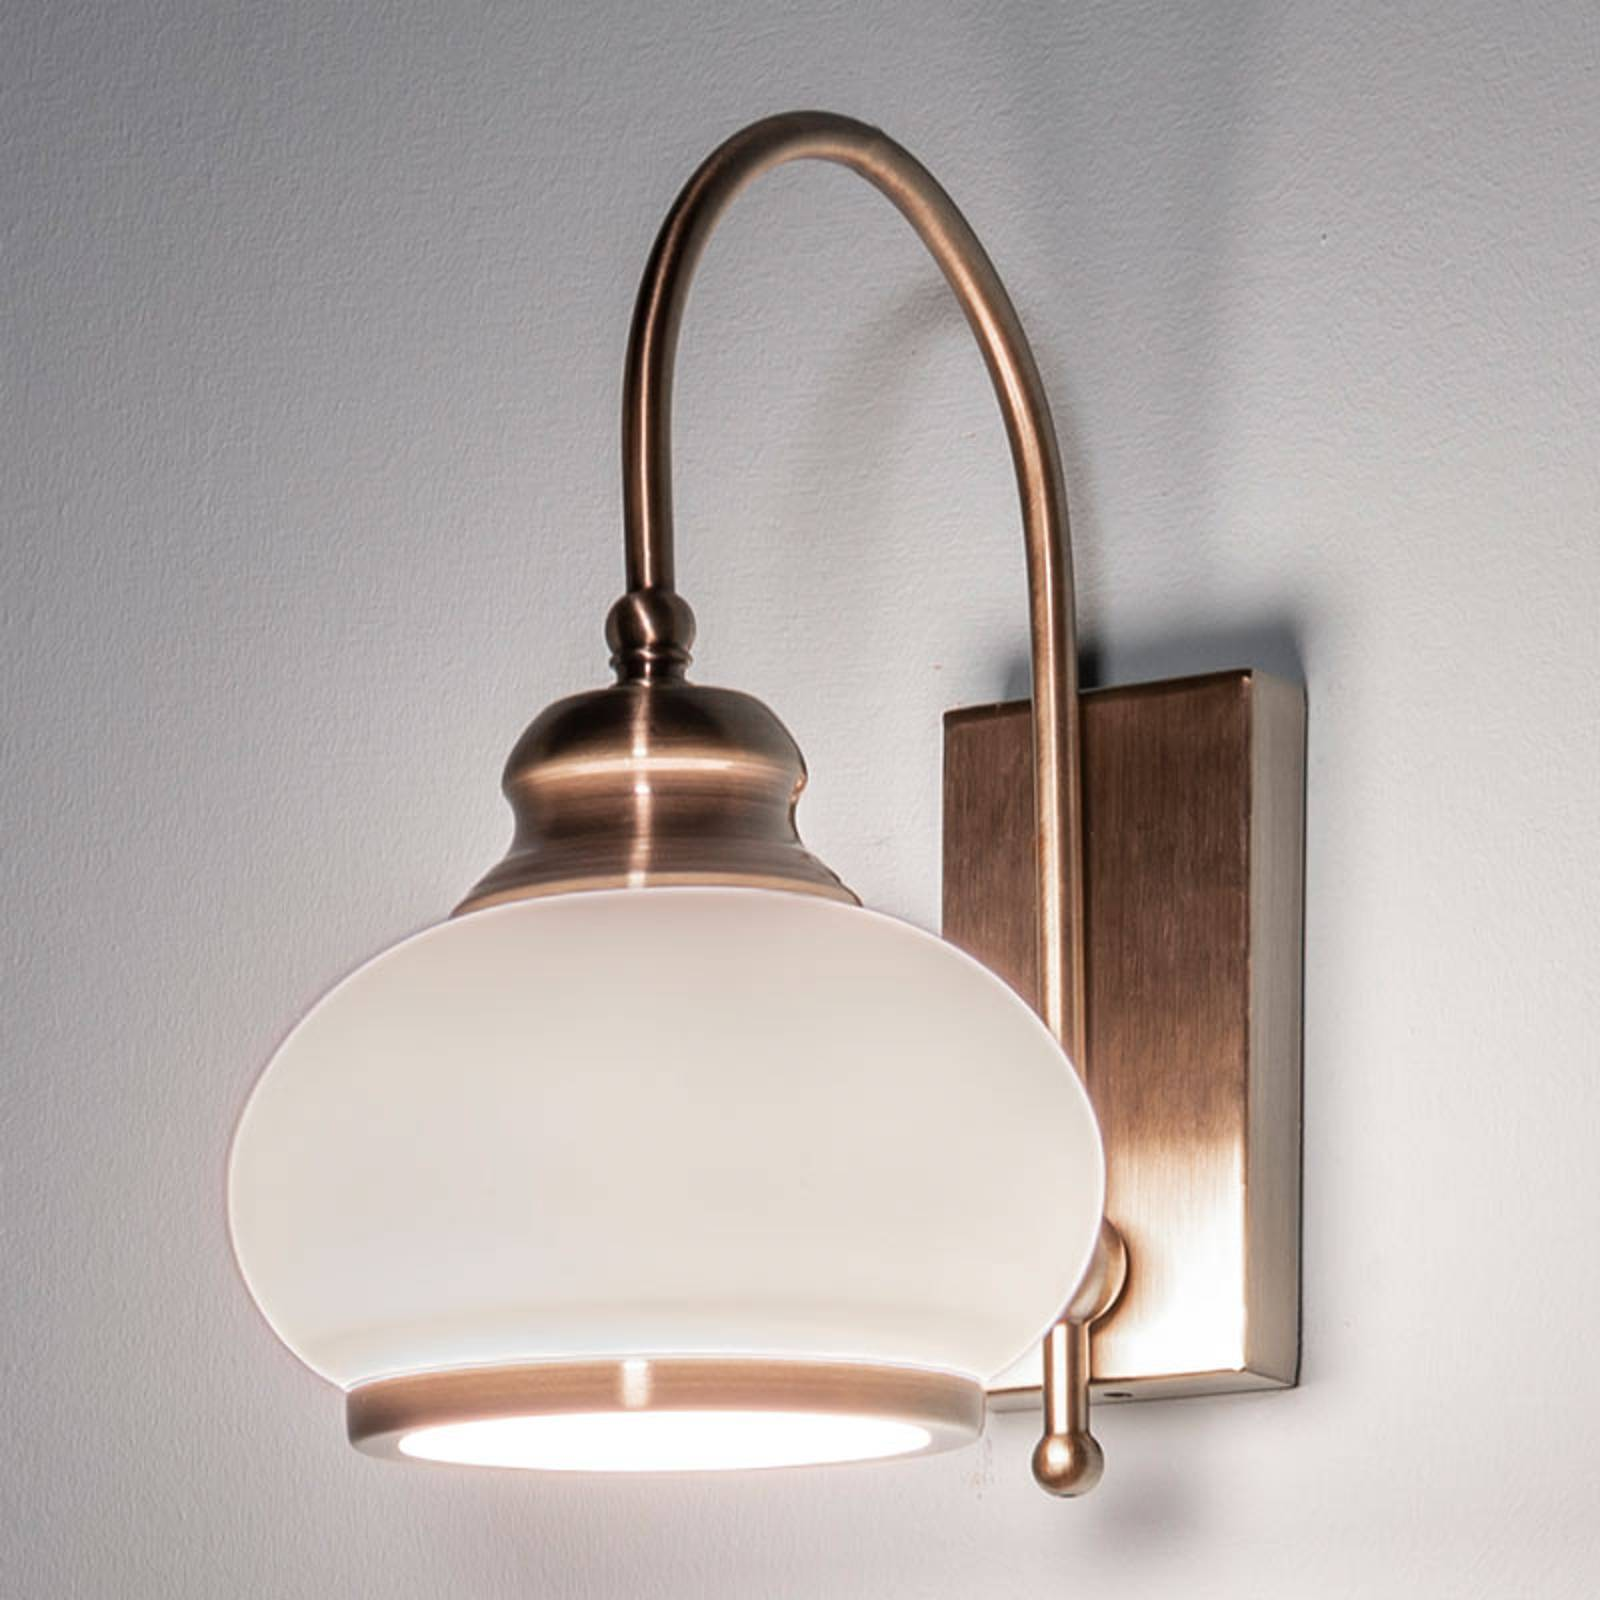 Wandlamp NOSTALGIKA, oud-messing